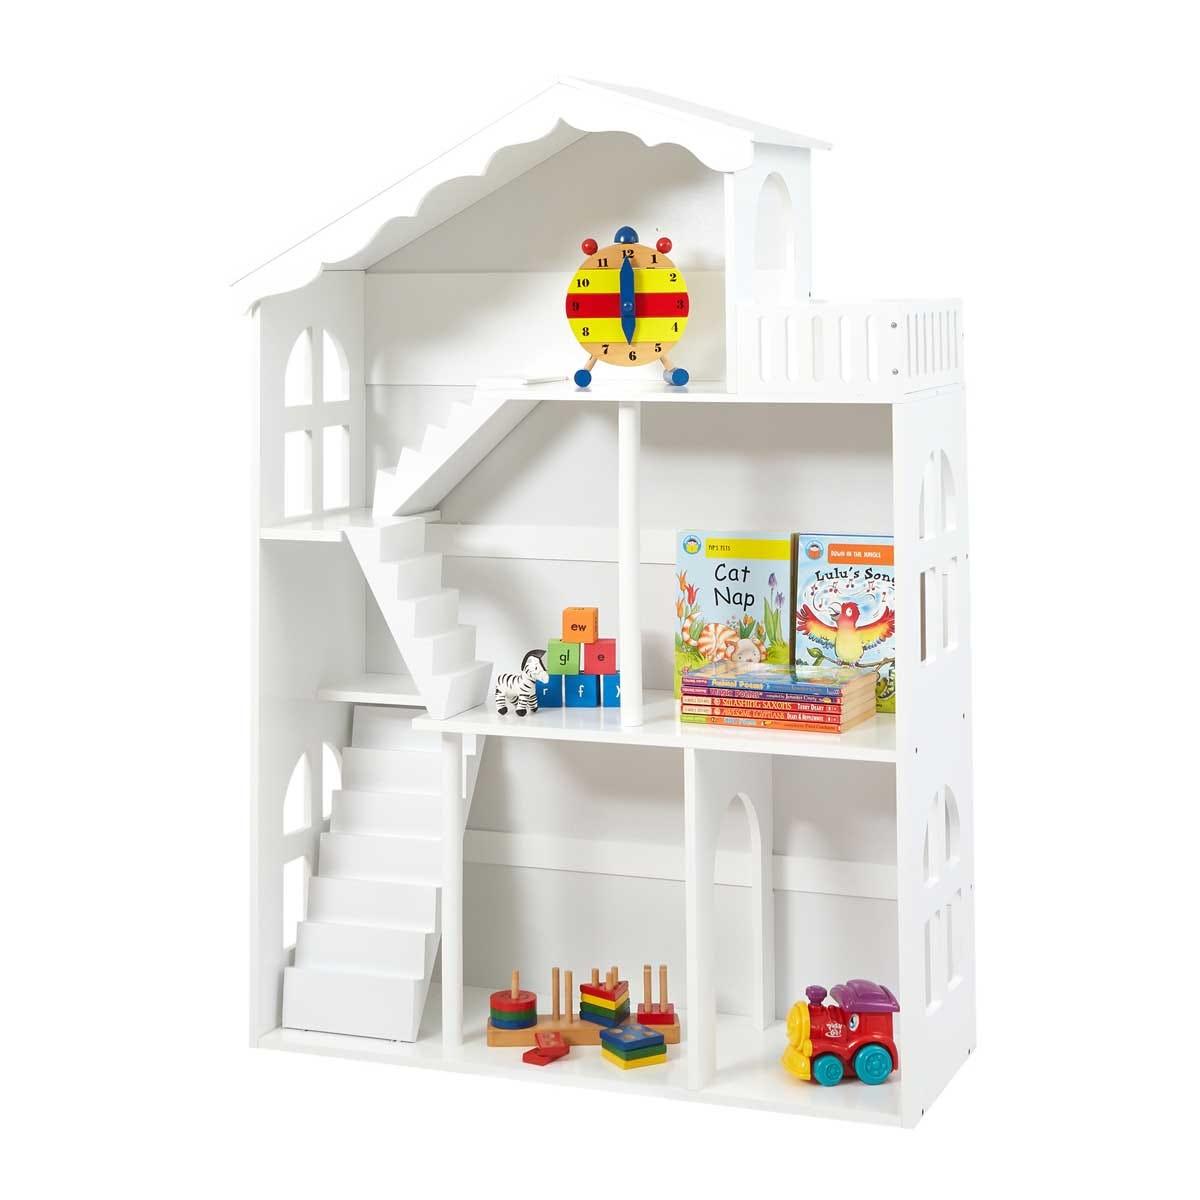 Liberty House Toys White Dolls House Bookshelf with Balcony